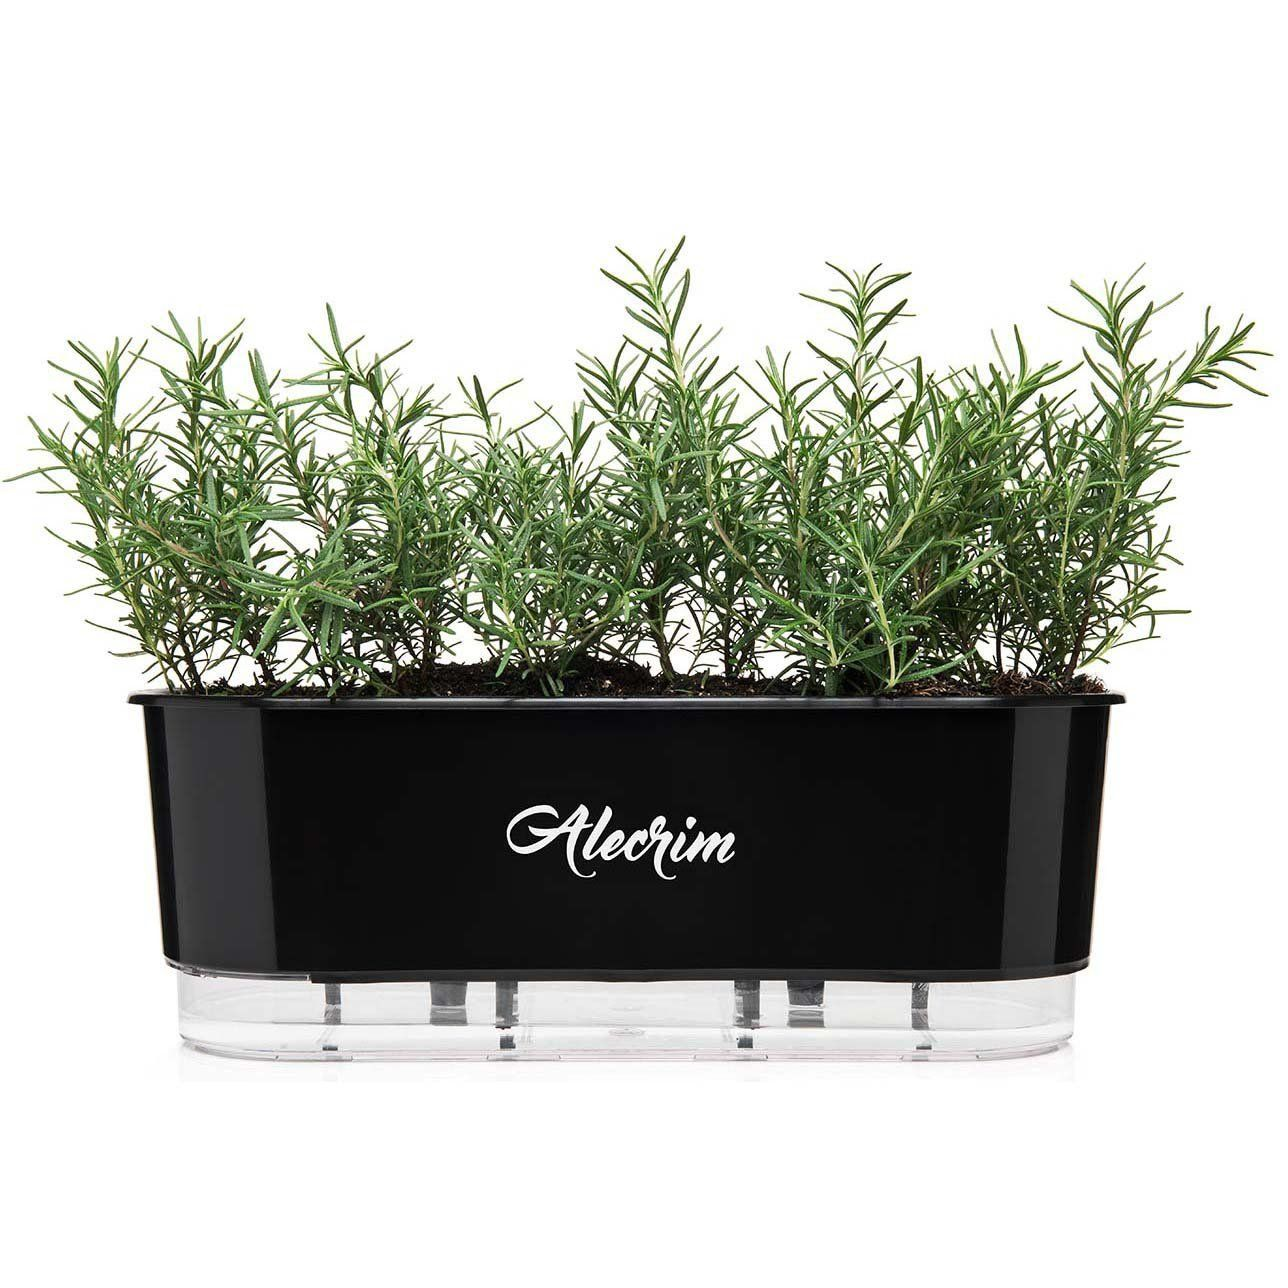 Vaso Autoirrigável Jardineira Alecrim Preto 40cm Raiz